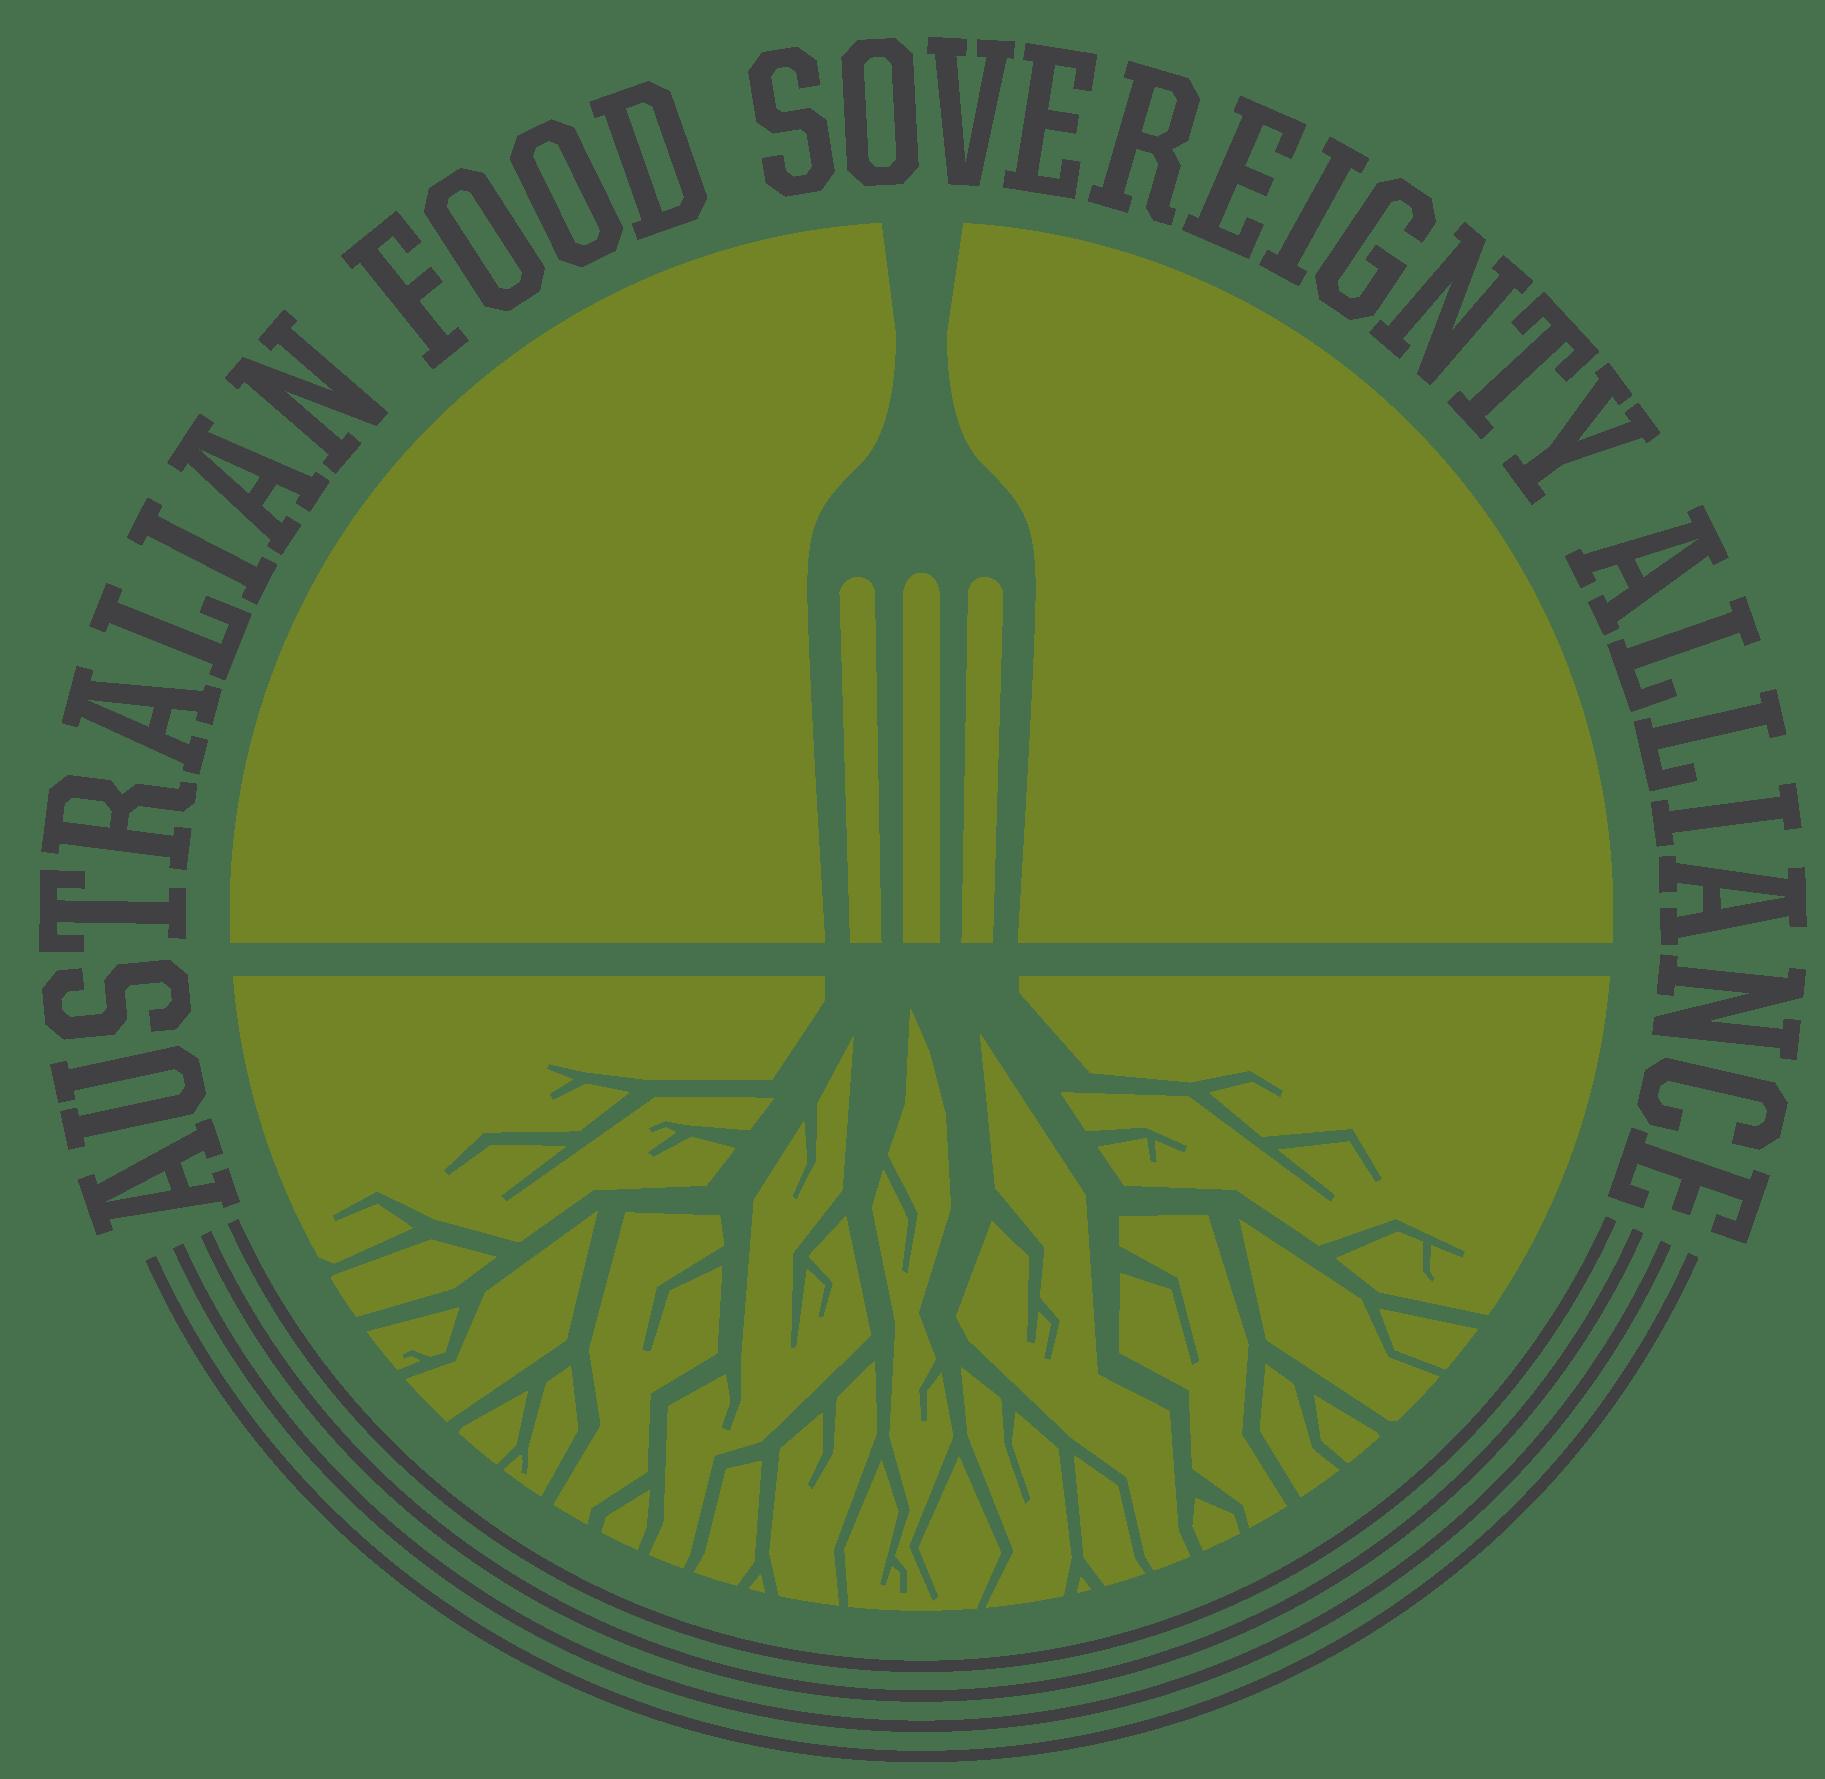 Land clipart agrarian. Our team australian food